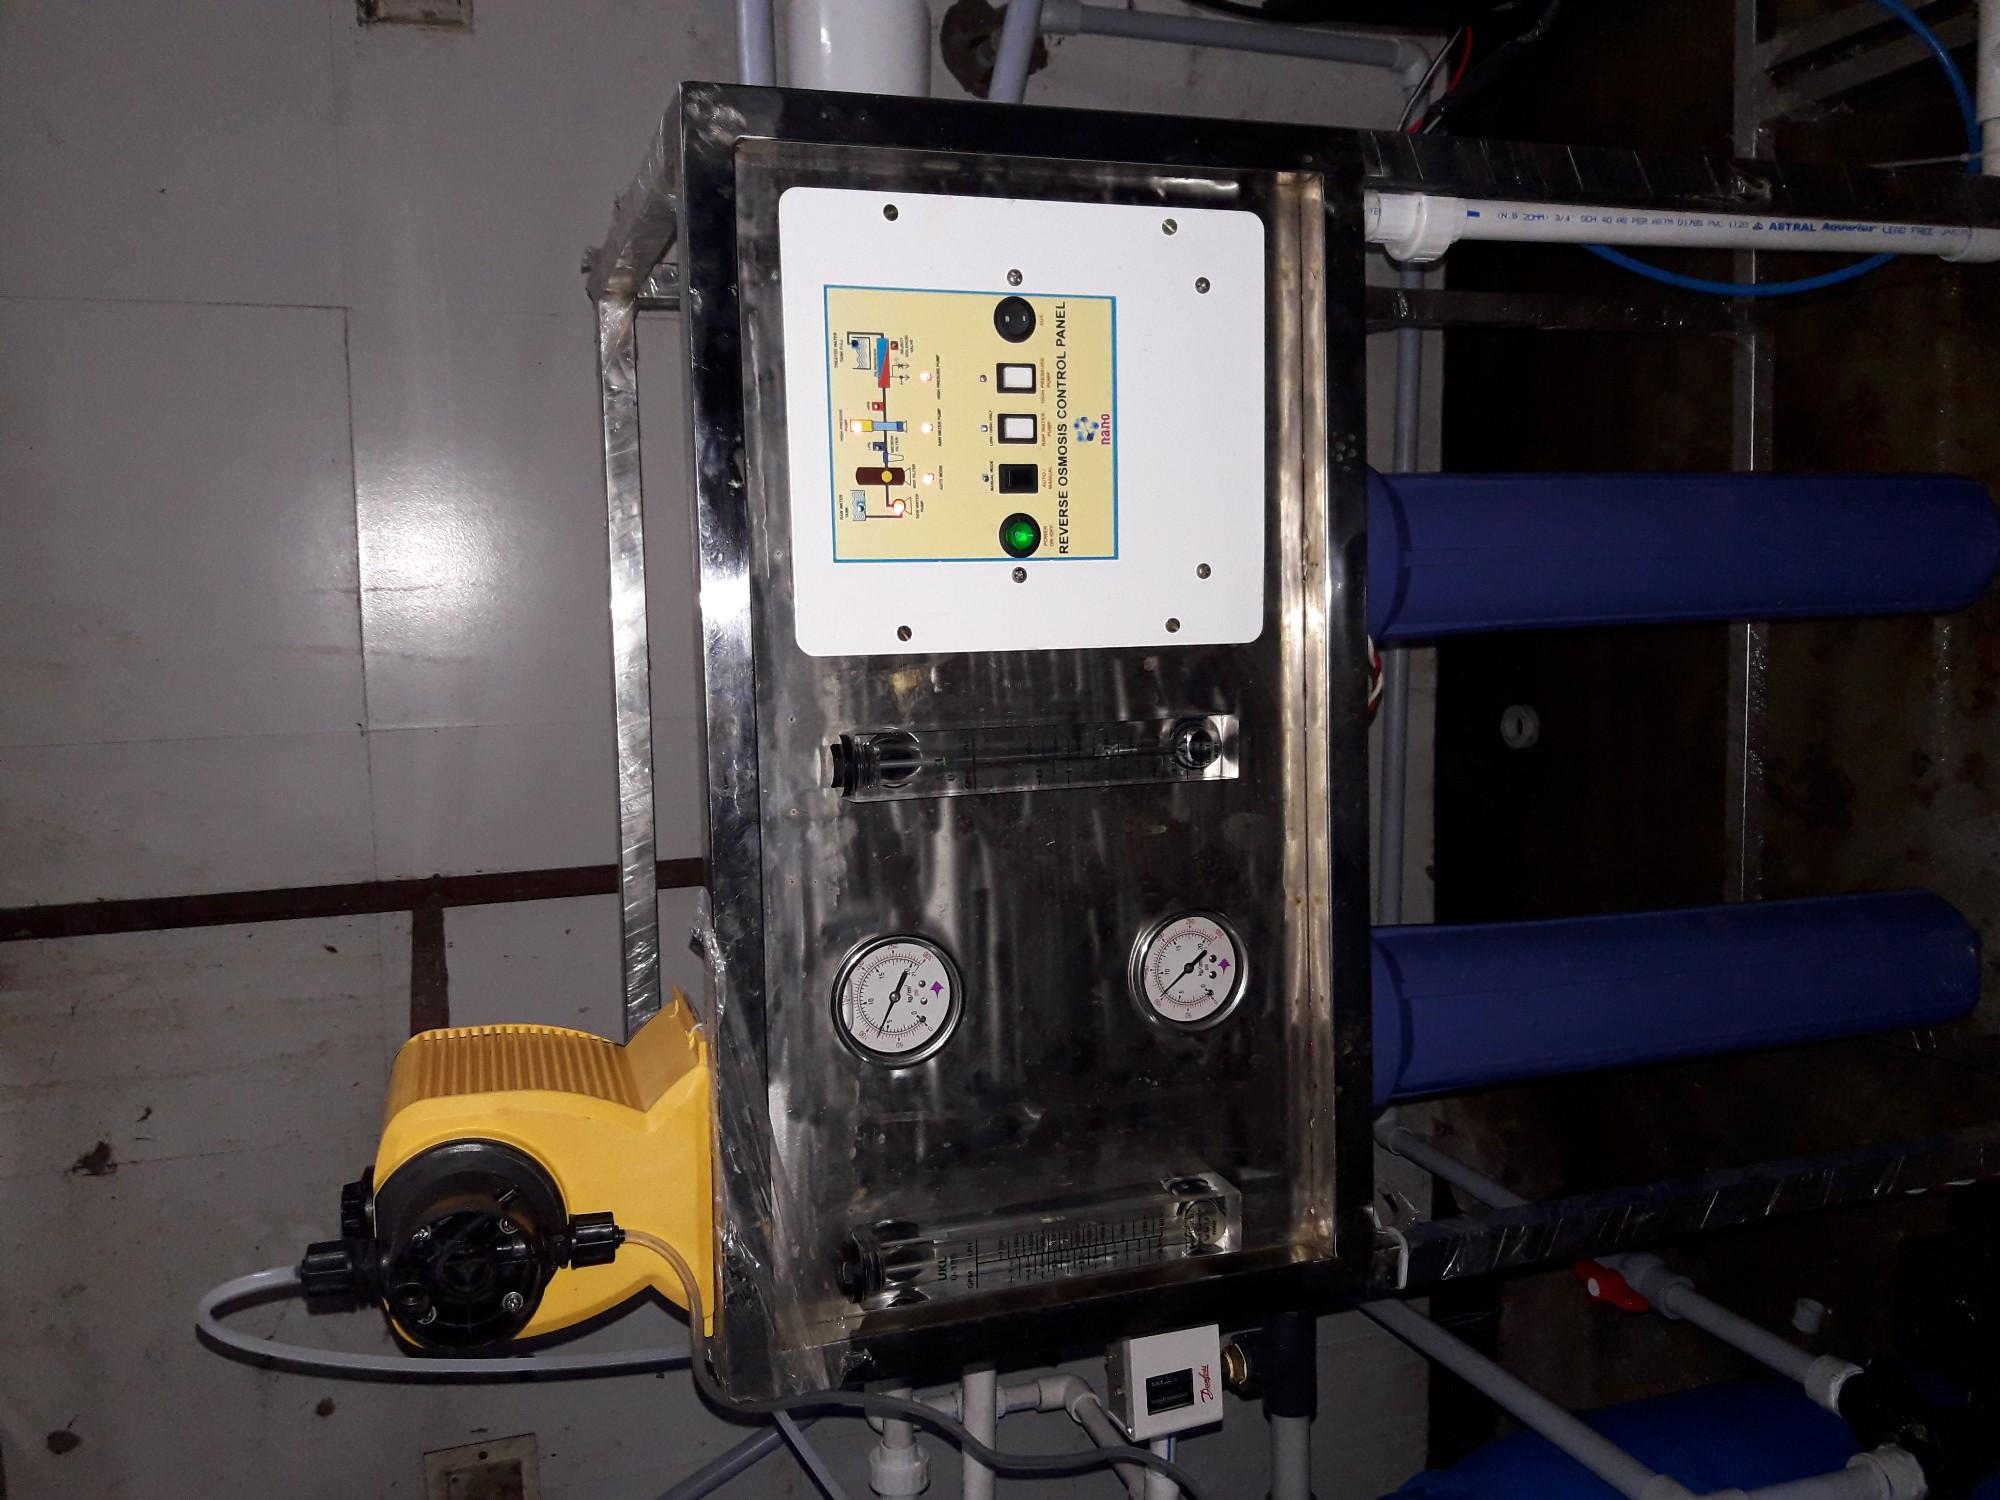 Water Purifier Dealers in Chennai, Best RO Water Purifier in